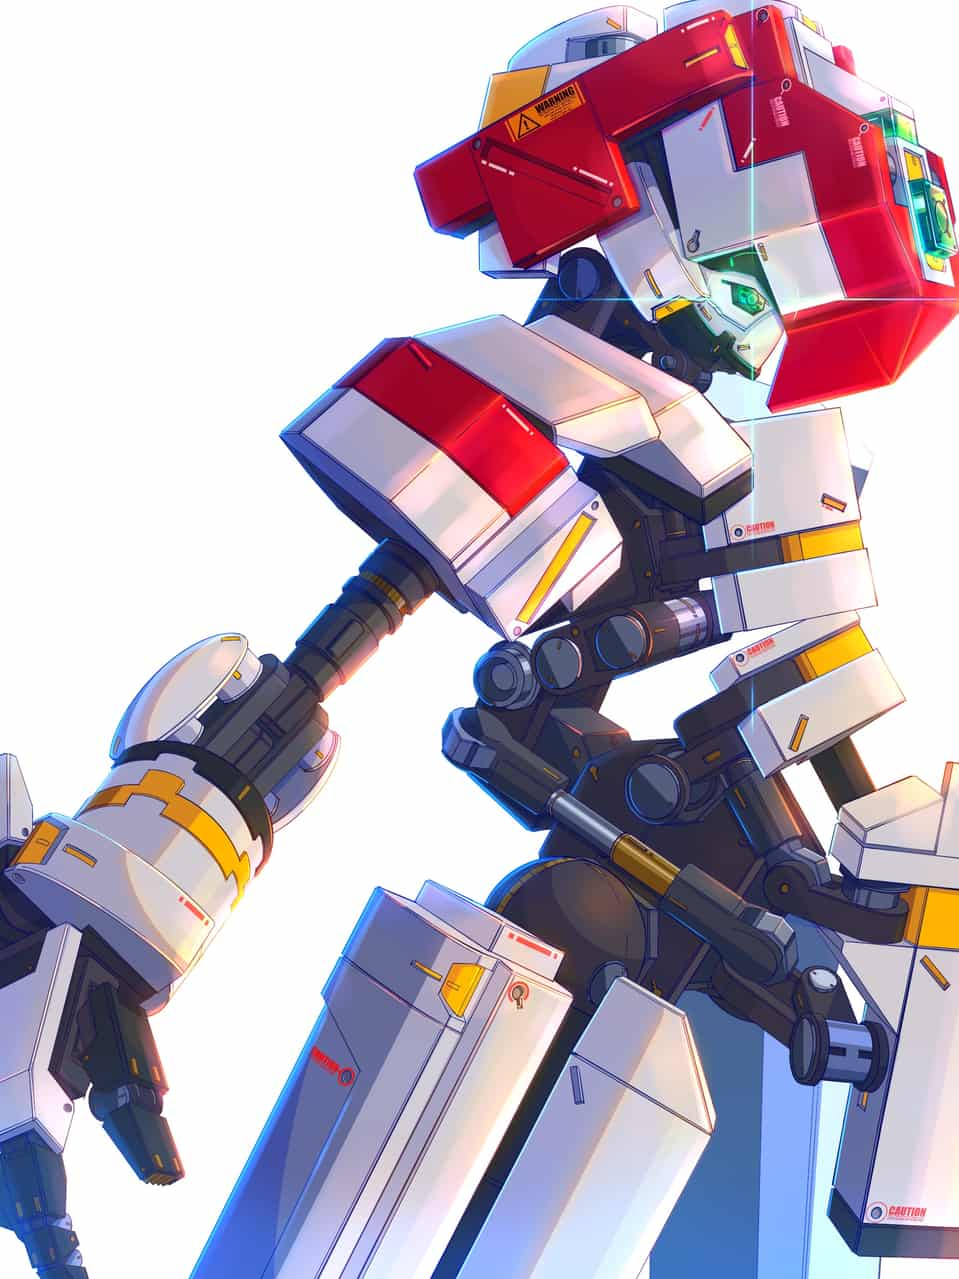 13/01/2020 Illust of nica LEGO メカ ロボット